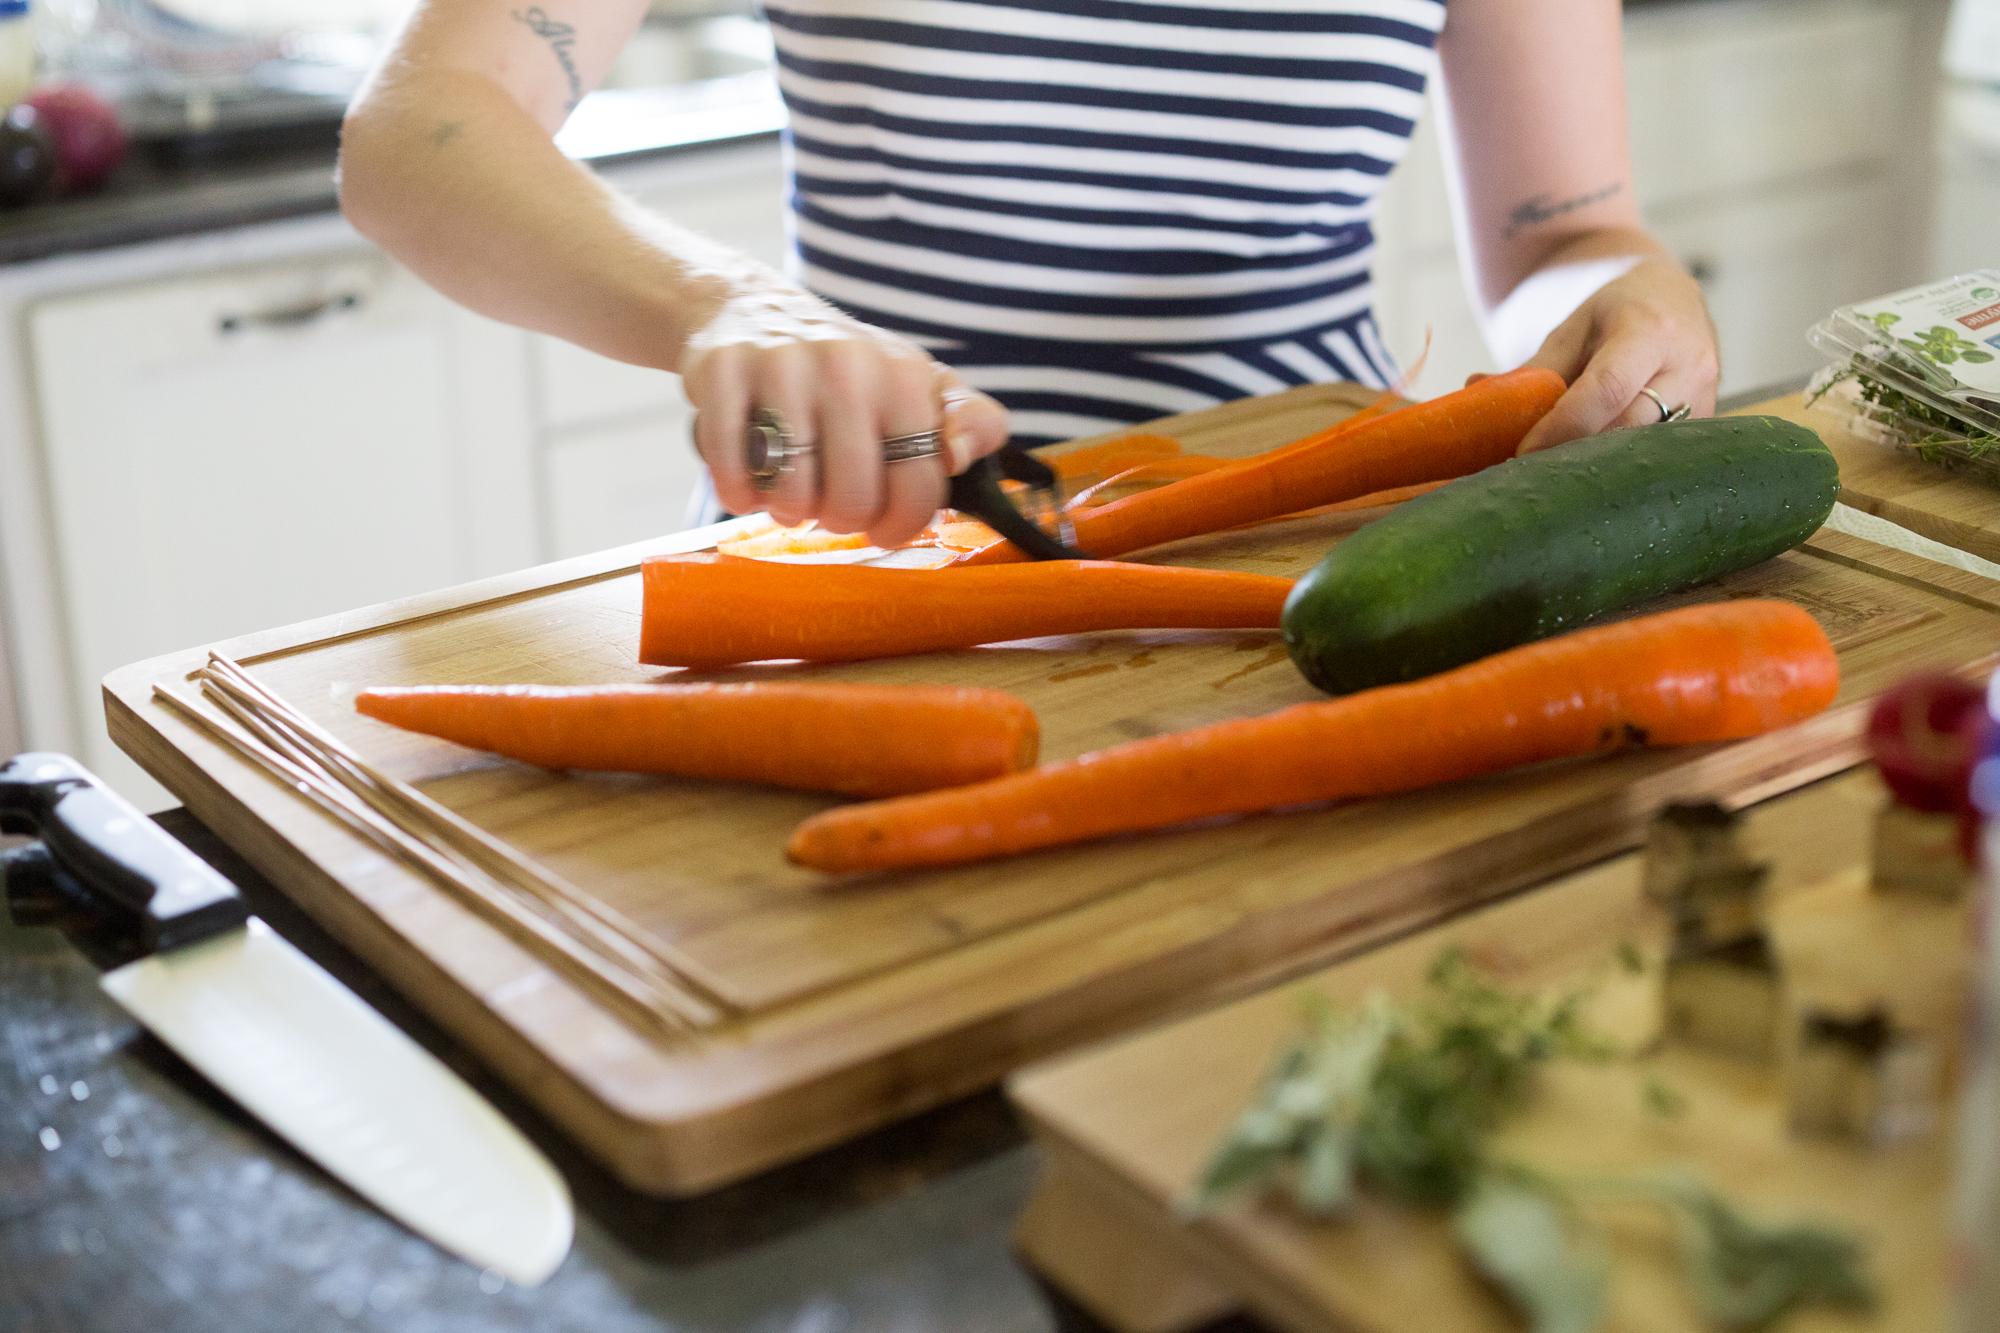 peeling veggies for easy veggie kabobs recipe